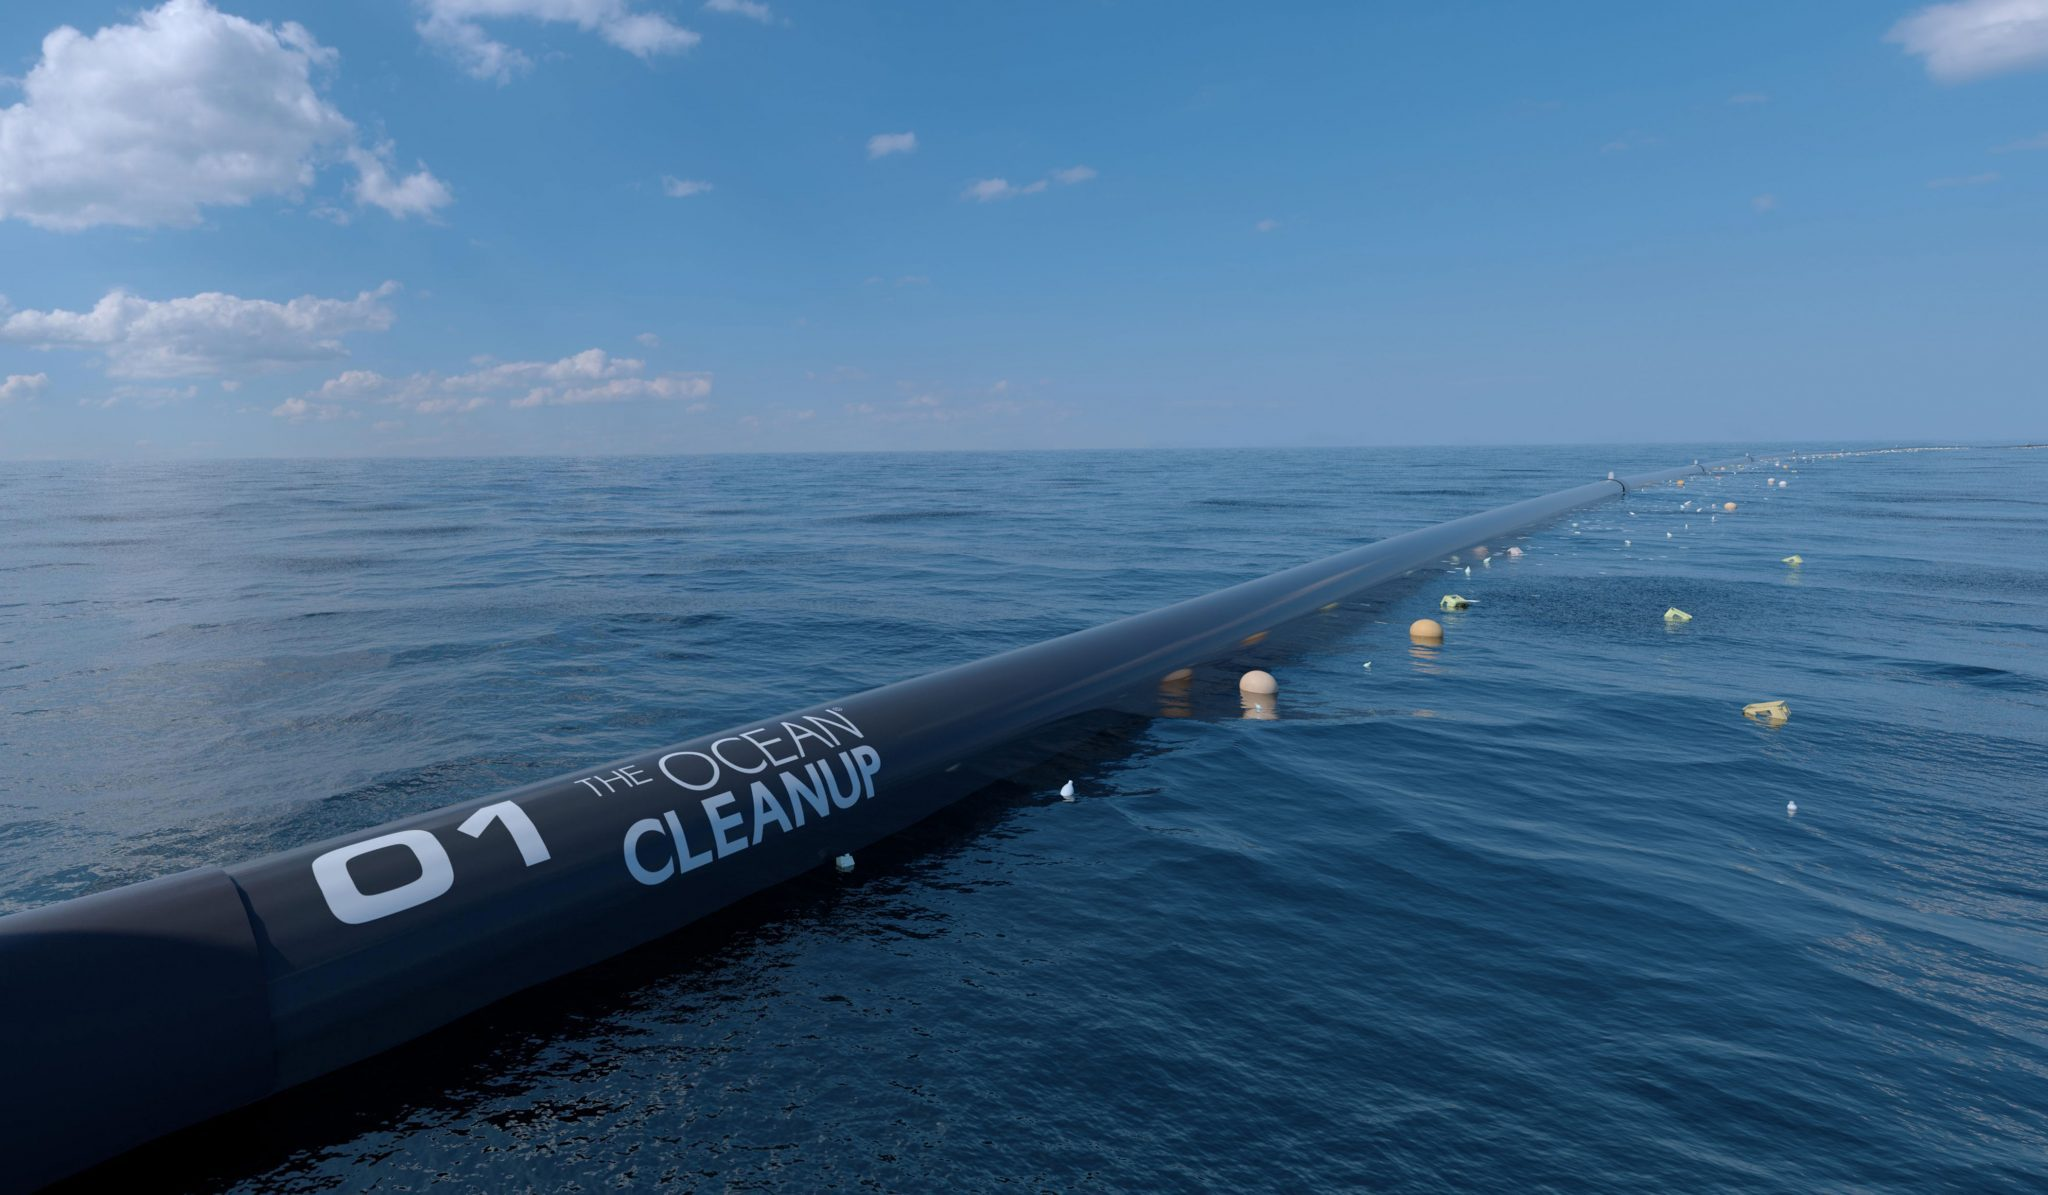 plastik aus Meer entfernen ocean cleanup